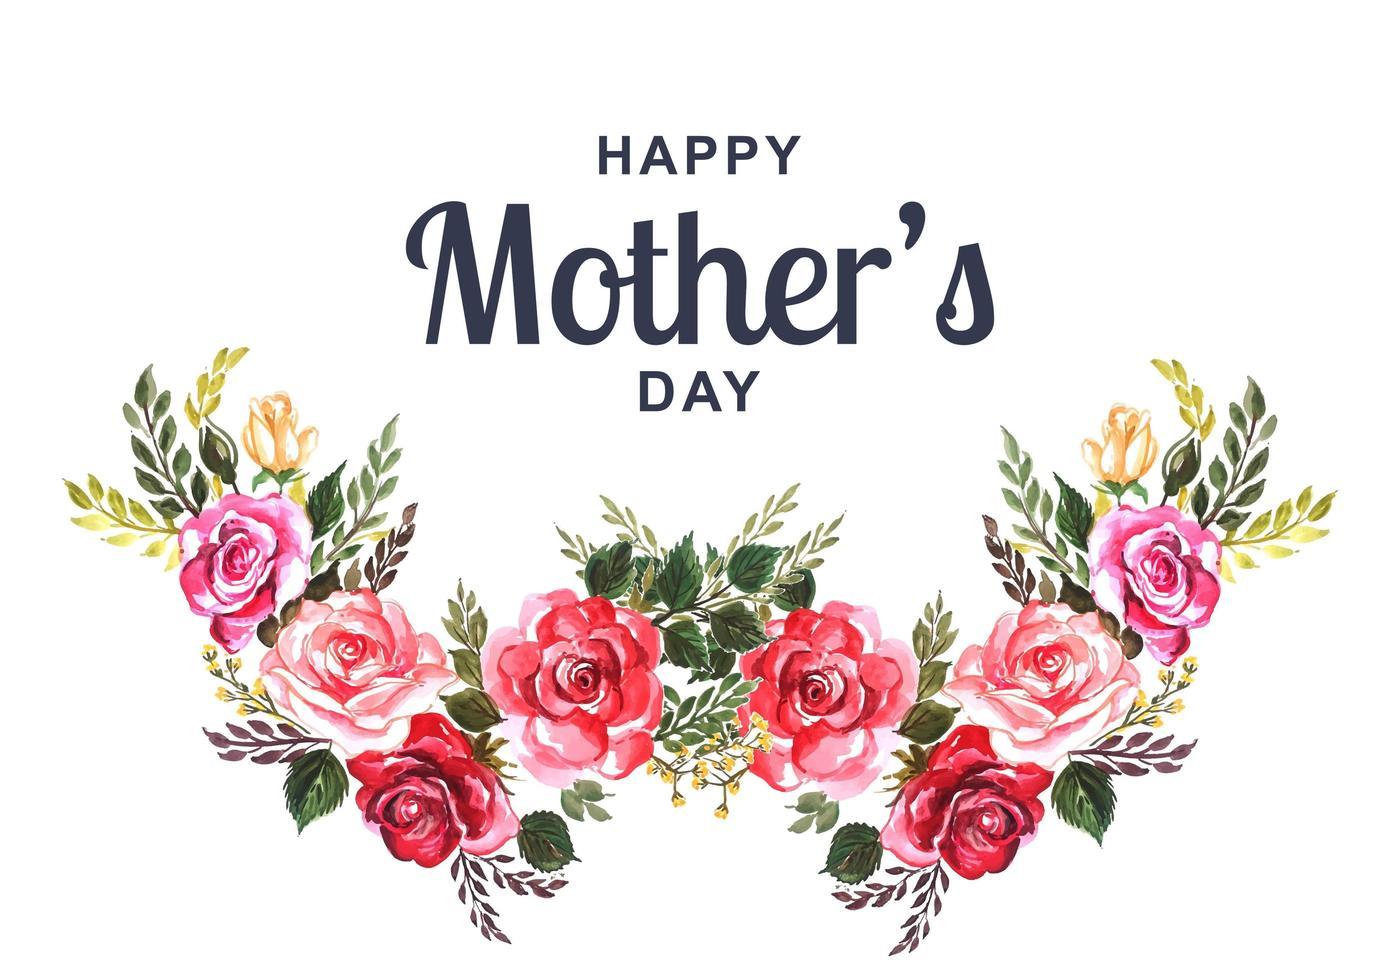 Muttertagskarte mit Aquarellblumenkranz vektor